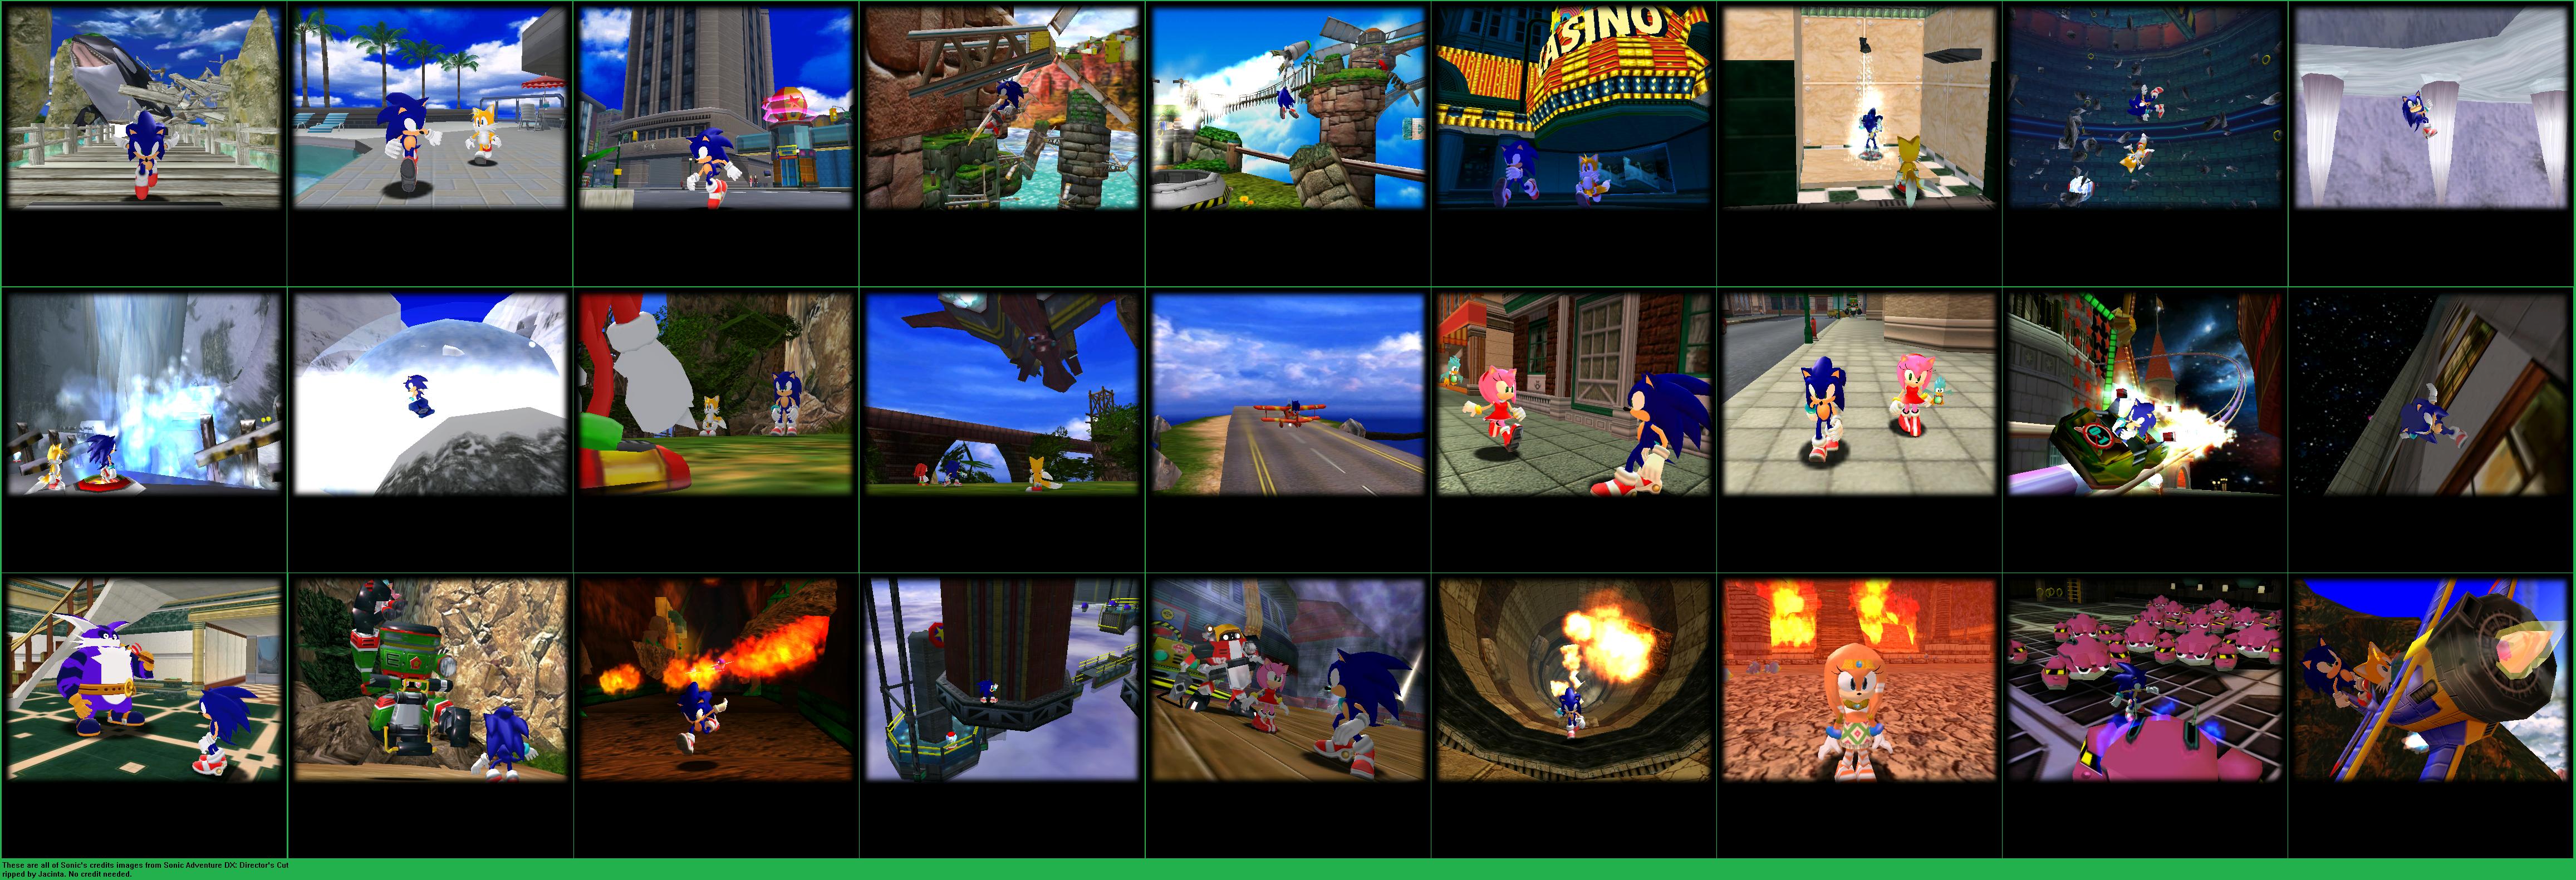 PC / Computer - Sonic Adventure DX: Director's Cut - Credits